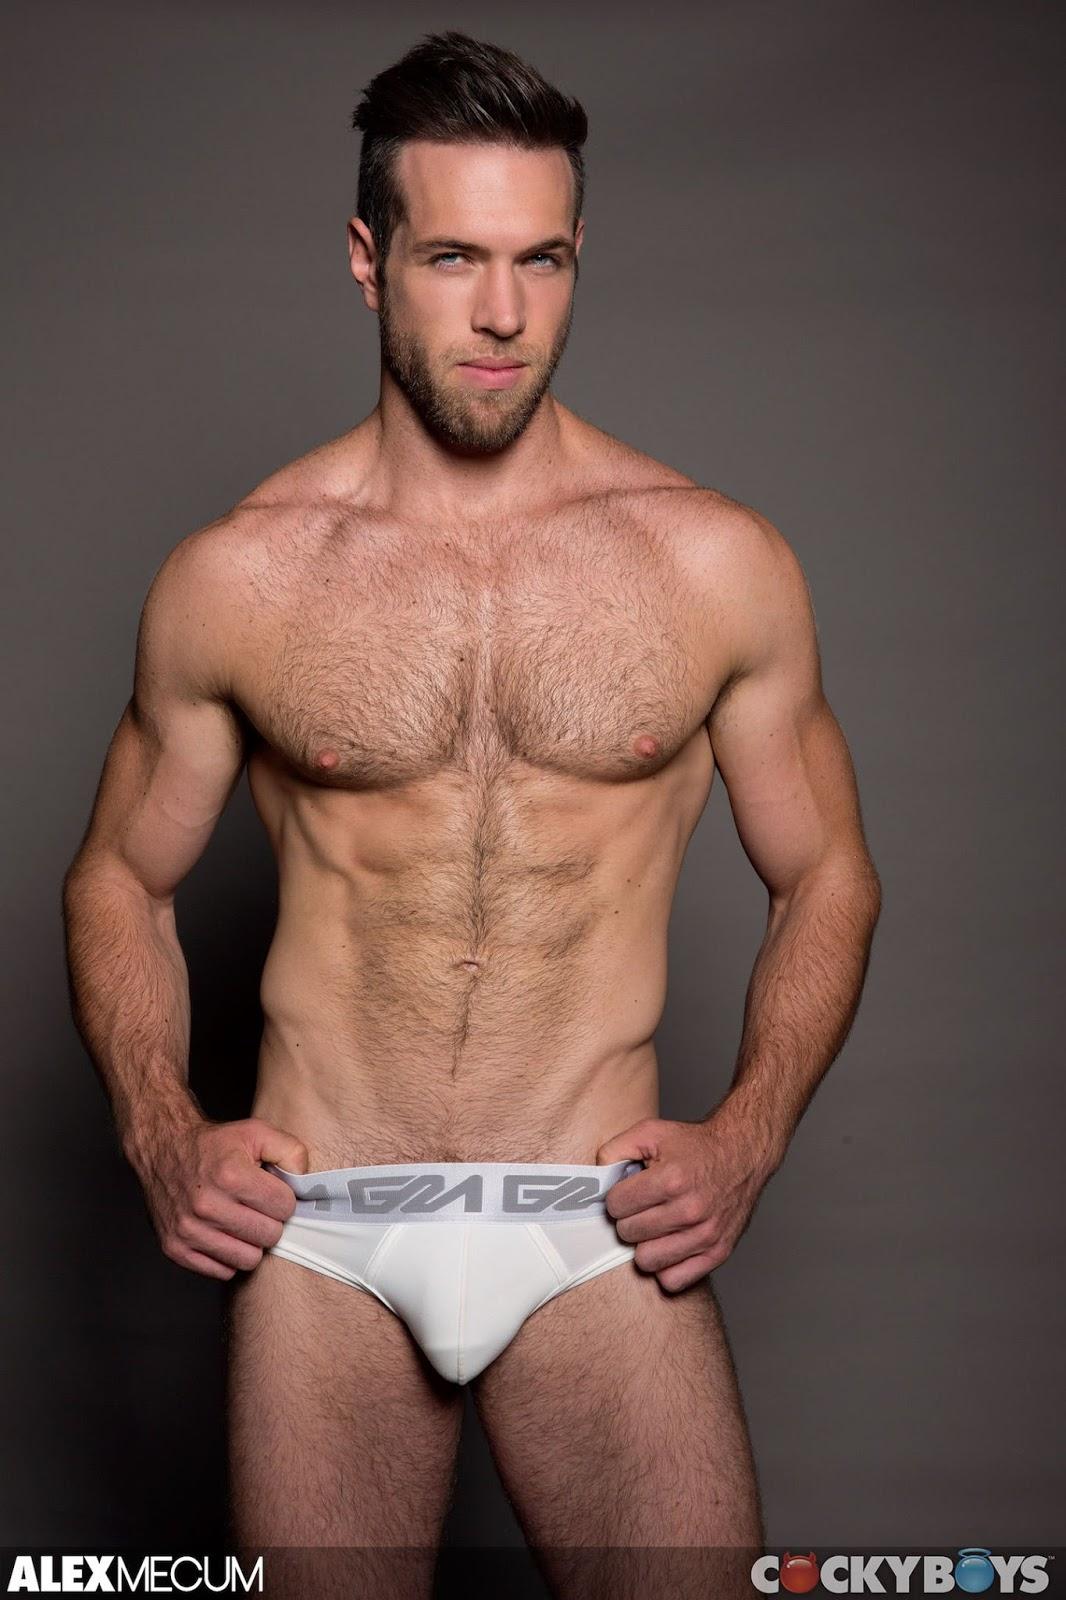 Hot boys in jockstraps having gay sex xxx 1